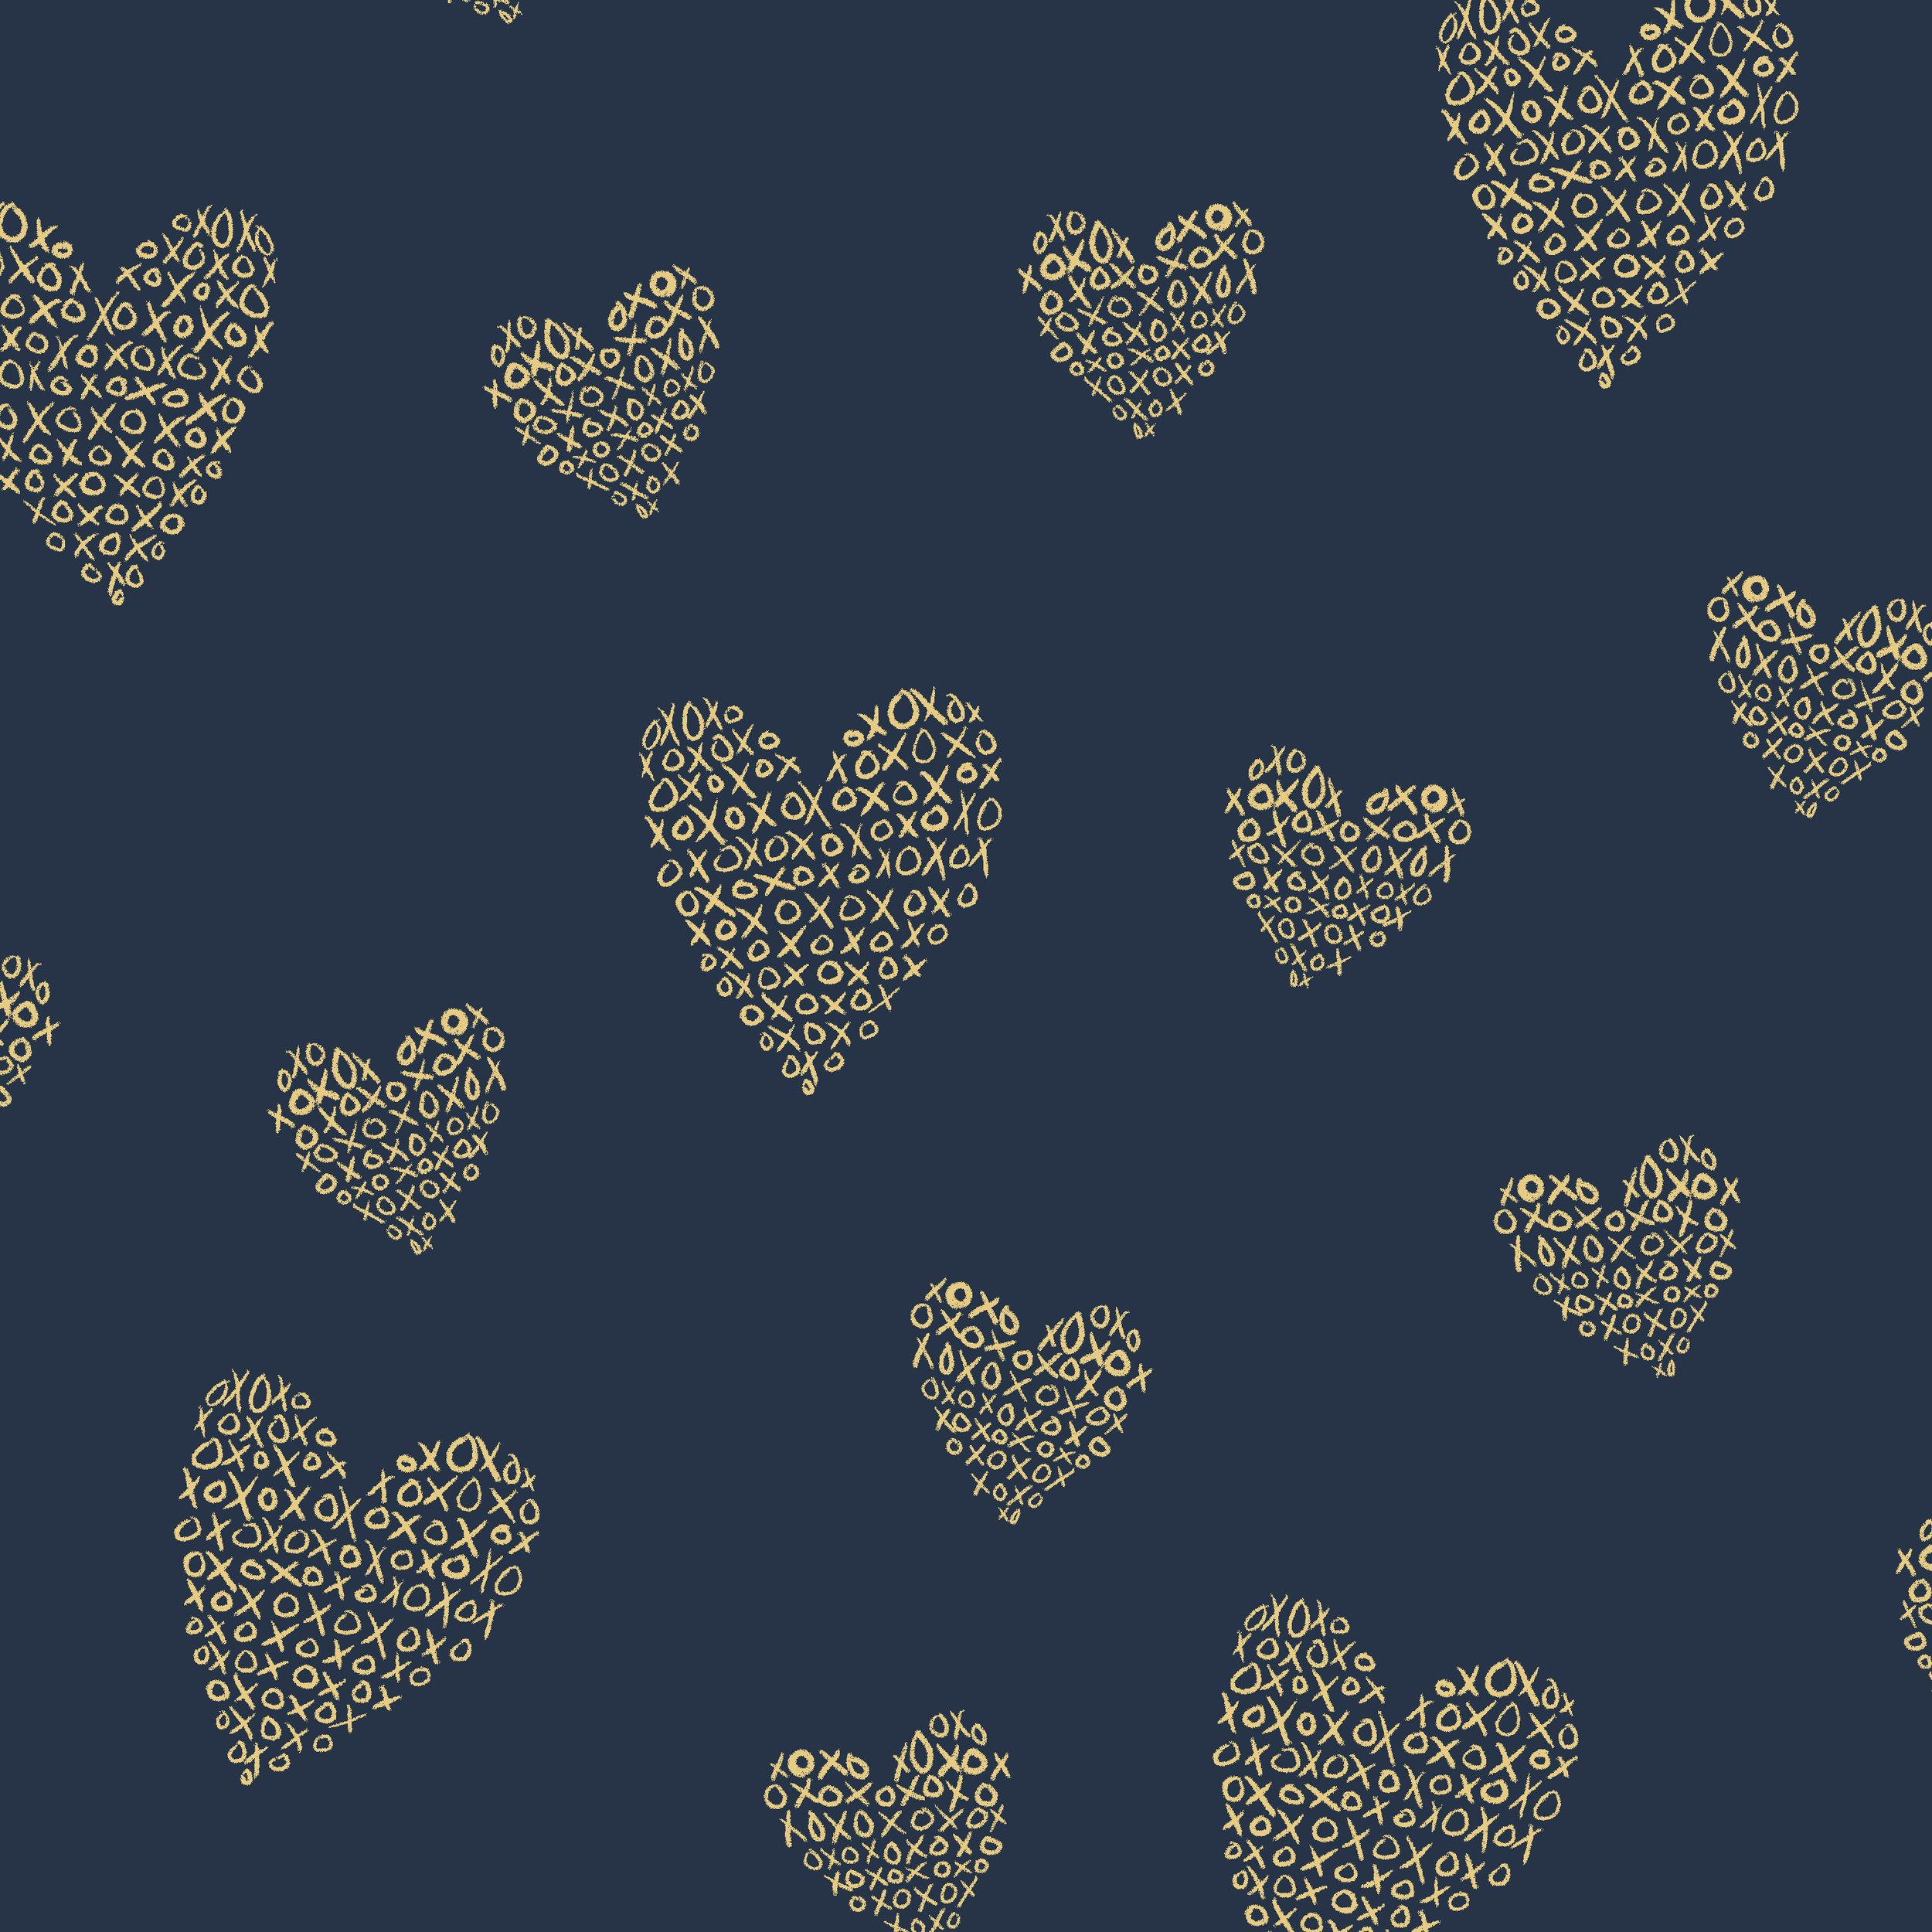 foil xoxo hearts